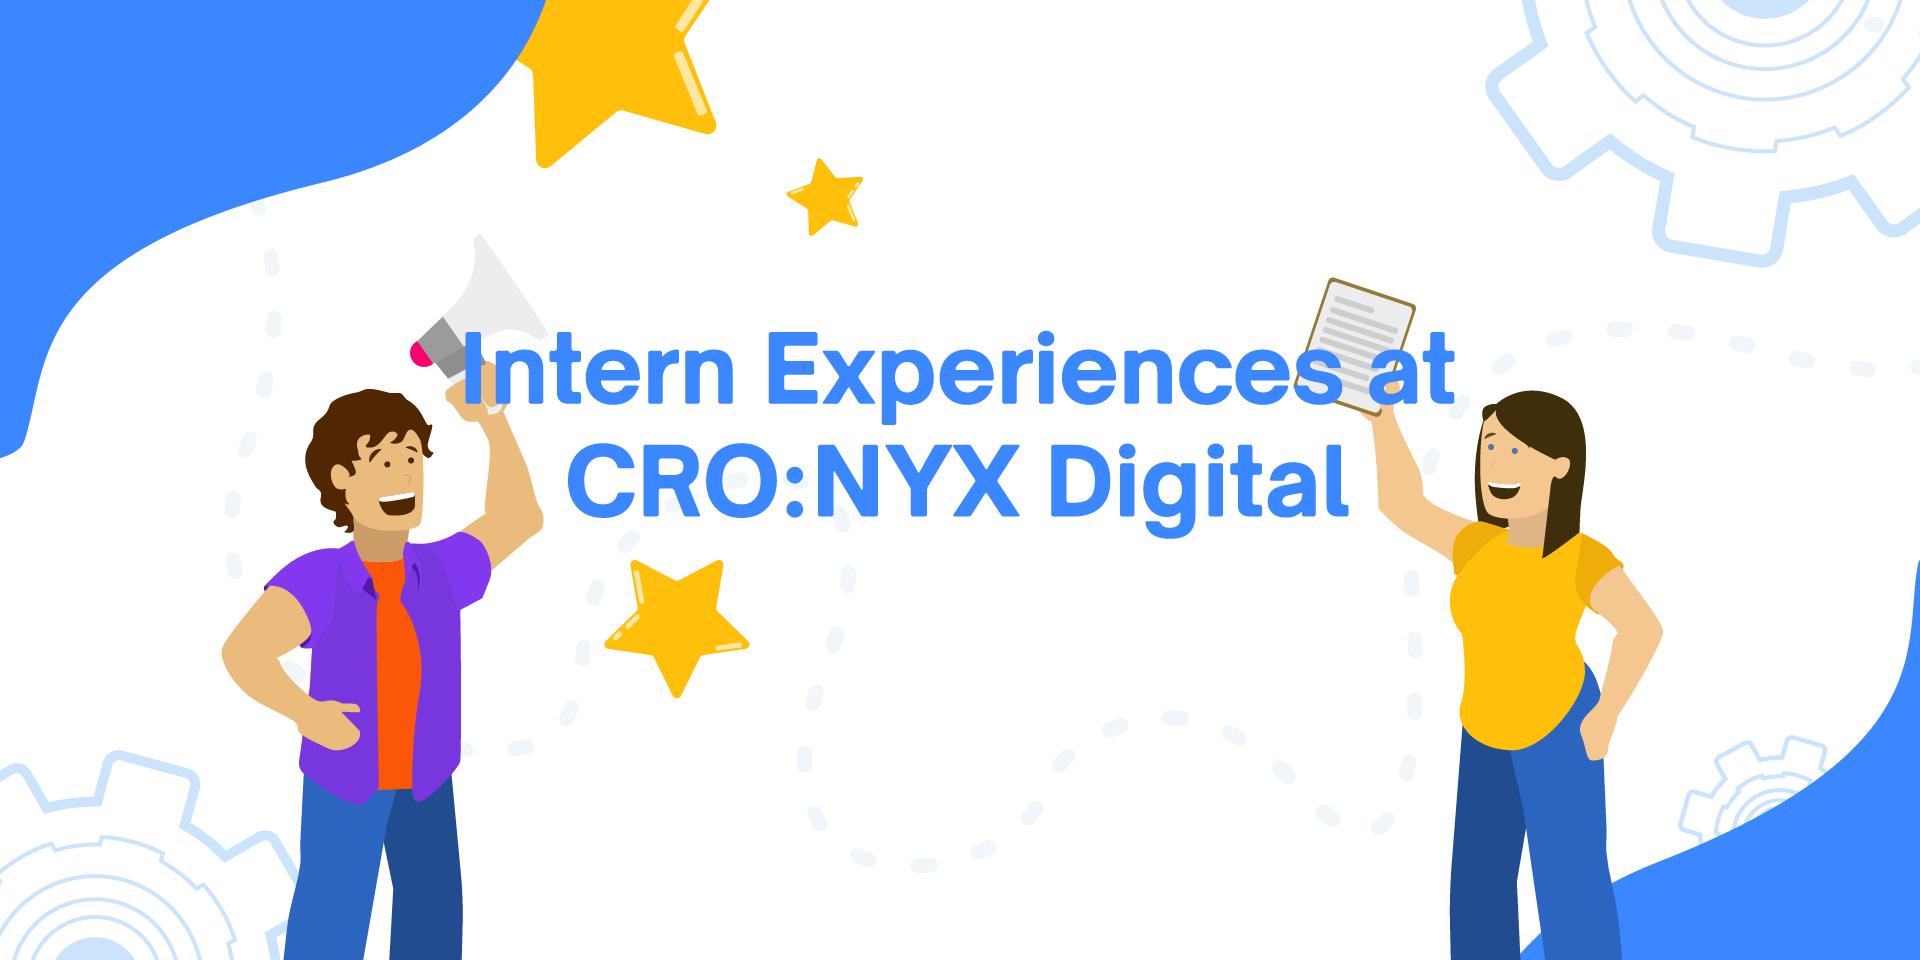 My Intern Experience at CRO:NYX Digital